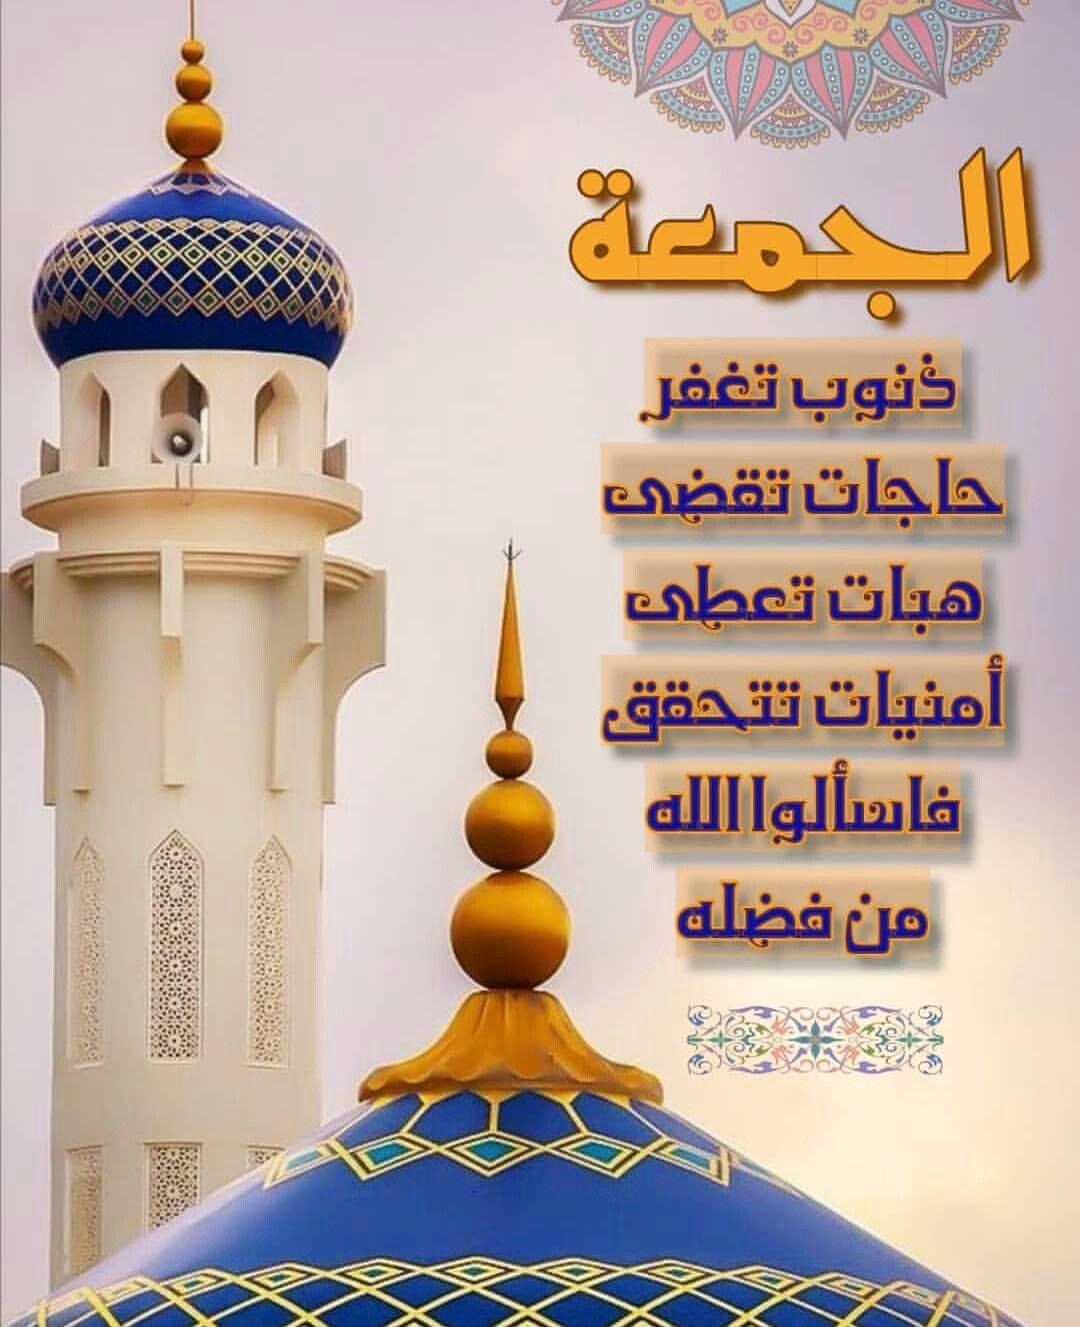 Pin By الصحبة الطيبة On جمعة طيبة Ramadan Quotes Jumma Mubarak Images Romantic Love Quotes